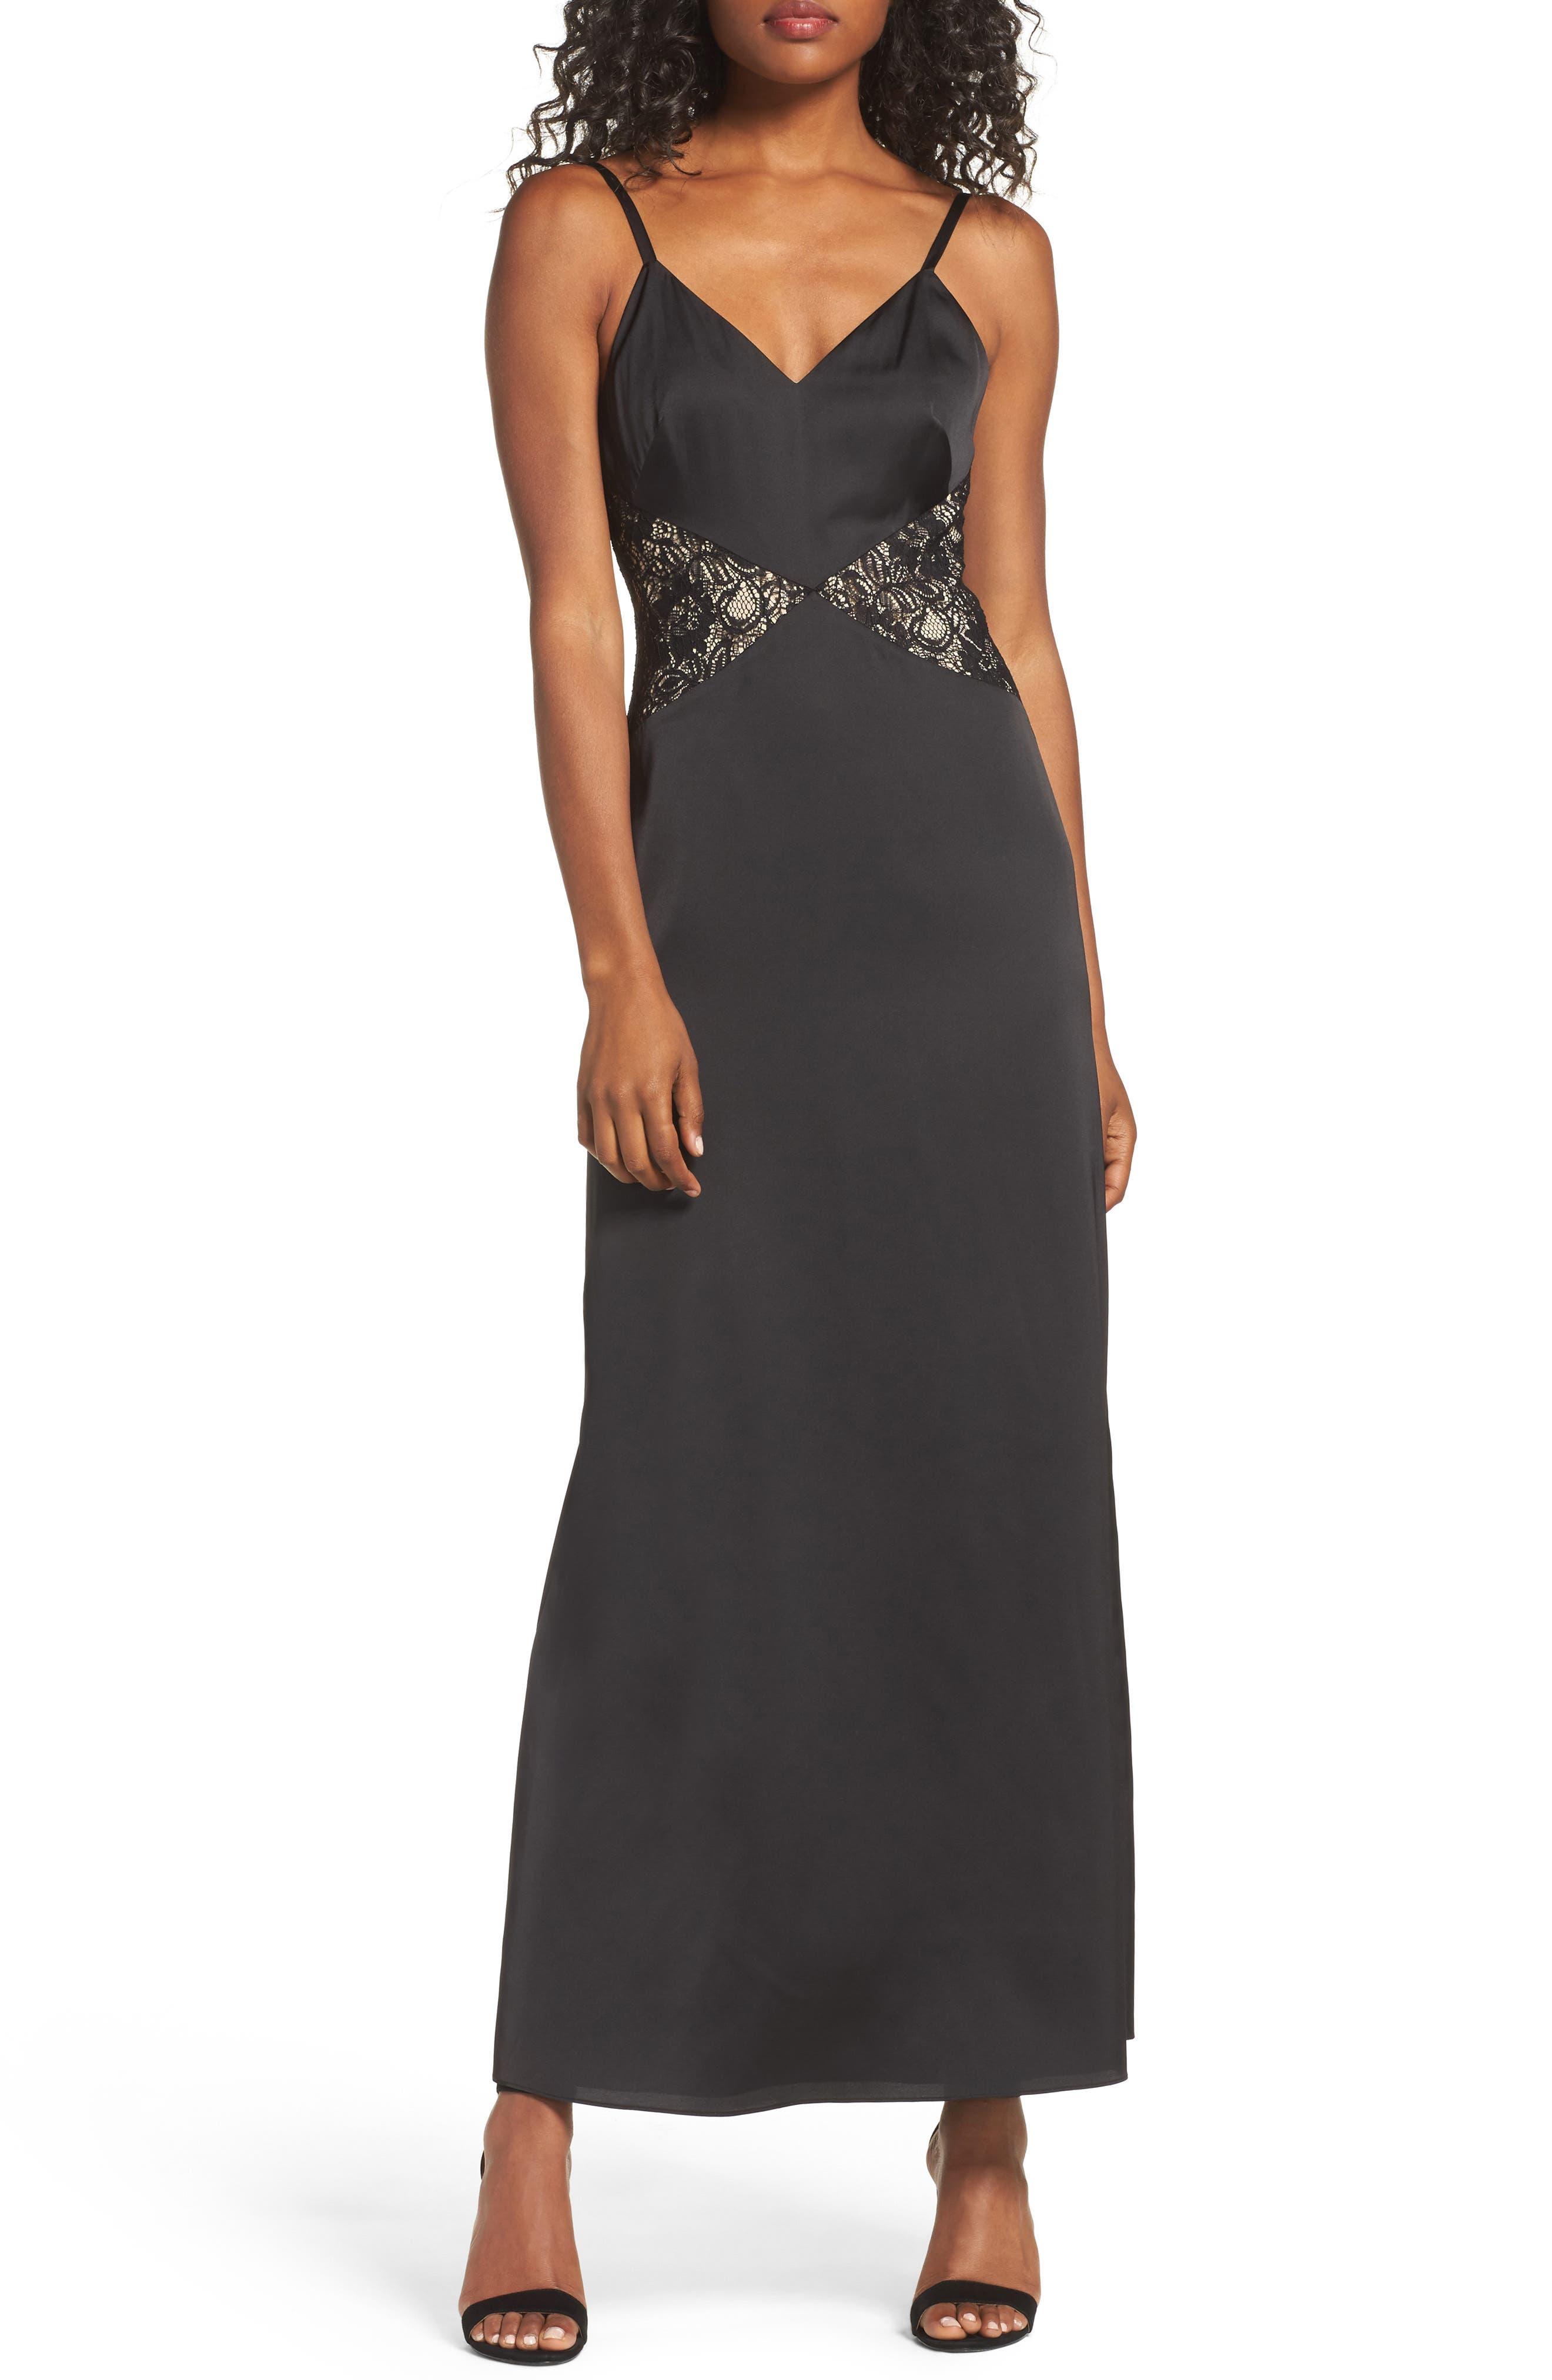 Femme Fatale Slip Dress,                         Main,                         color, 001